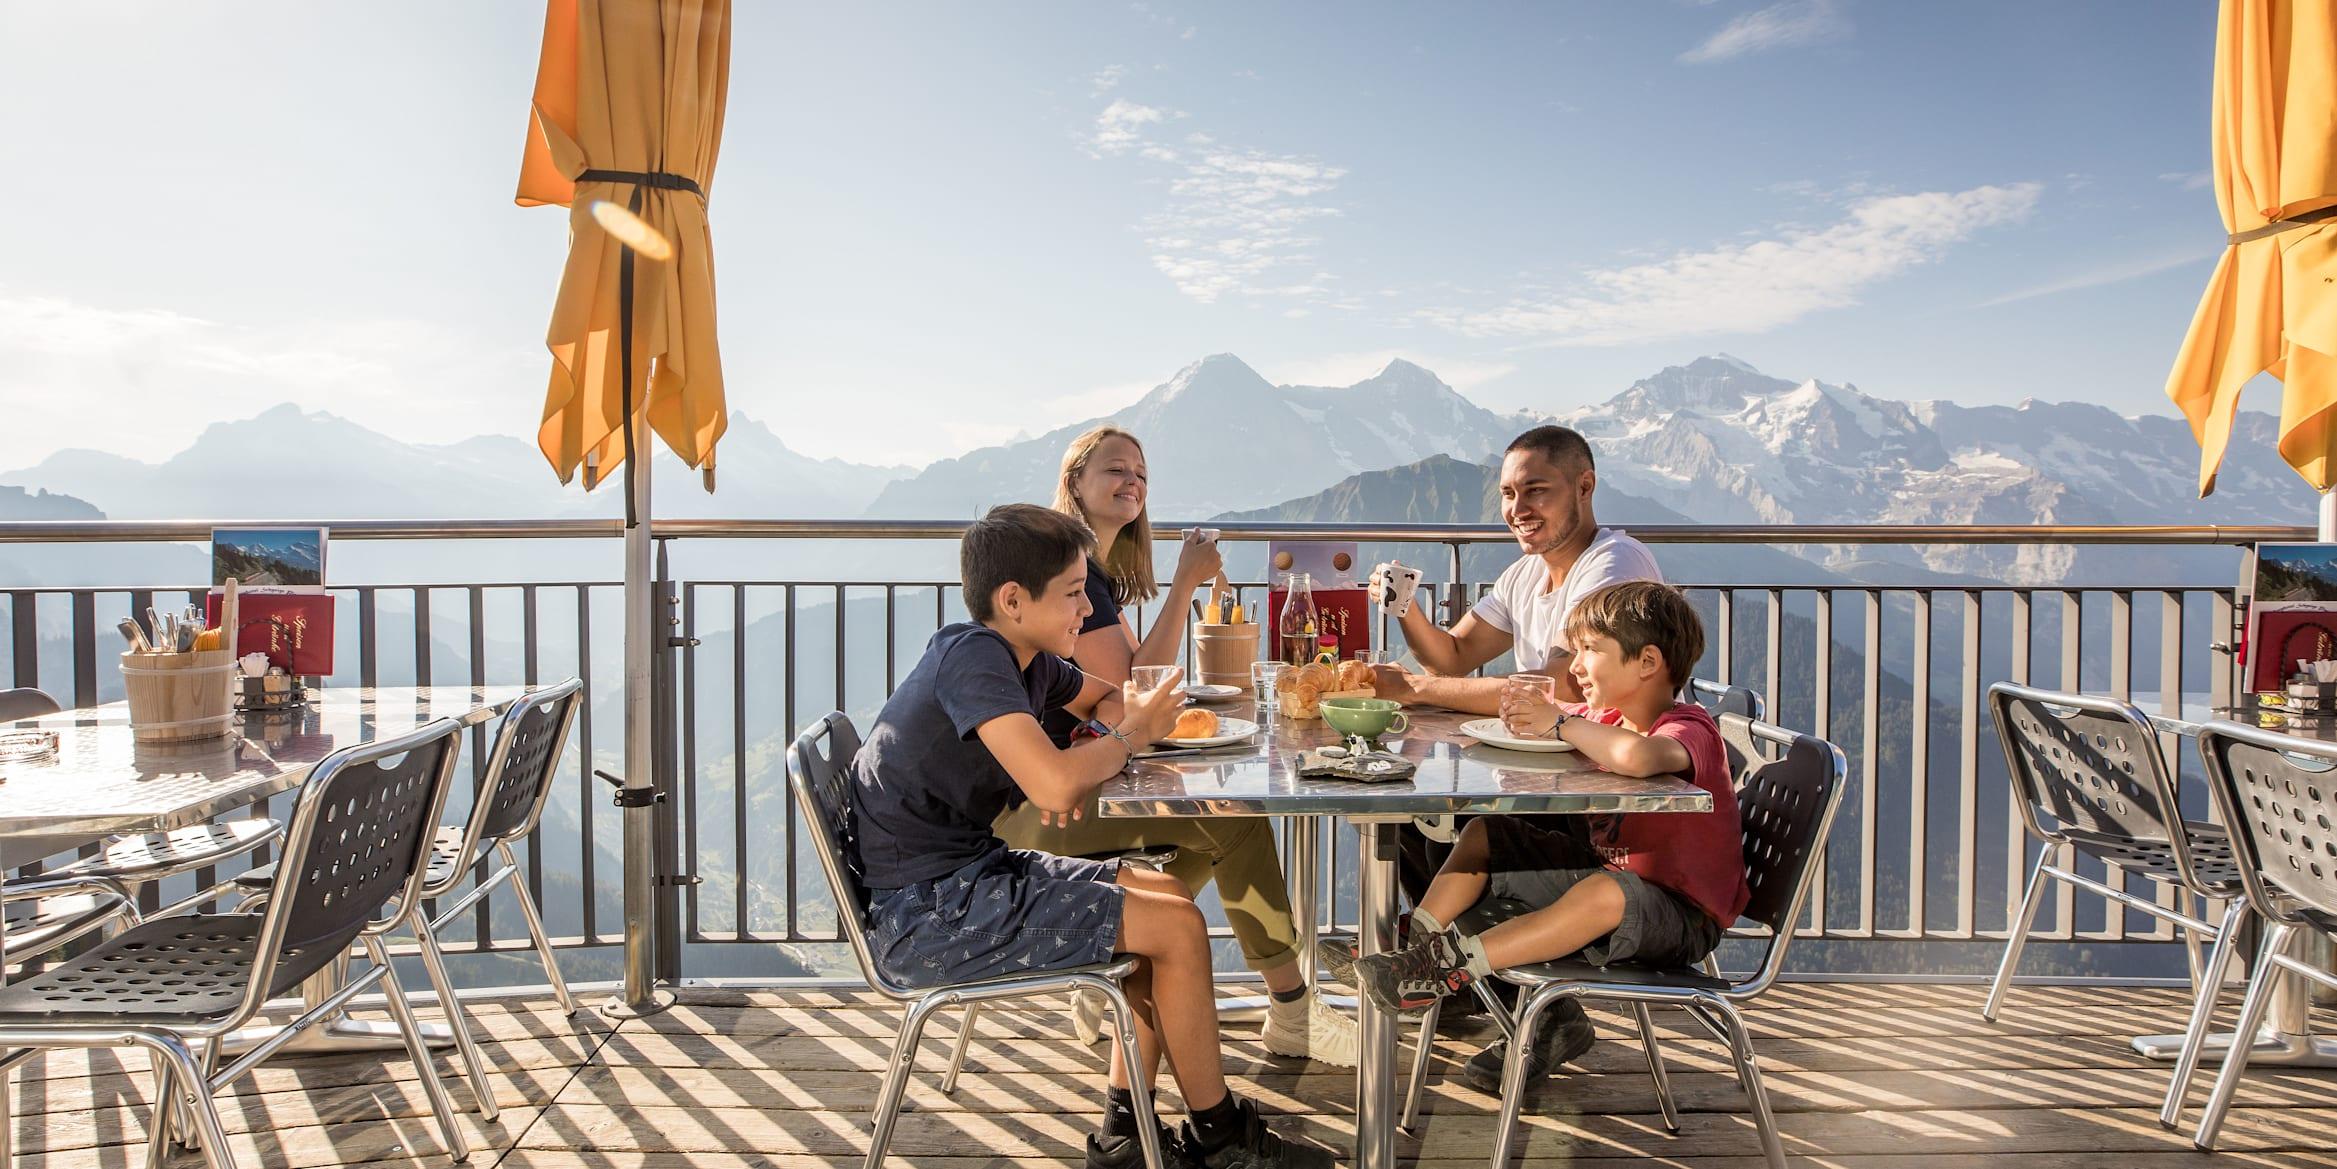 Mönch, Eiger, Eiger-Mönch-Jungfrau, Jungfrau, Schynige-Platte, Berghotel-Schynige-Platte, Screen-Content, Aussicht